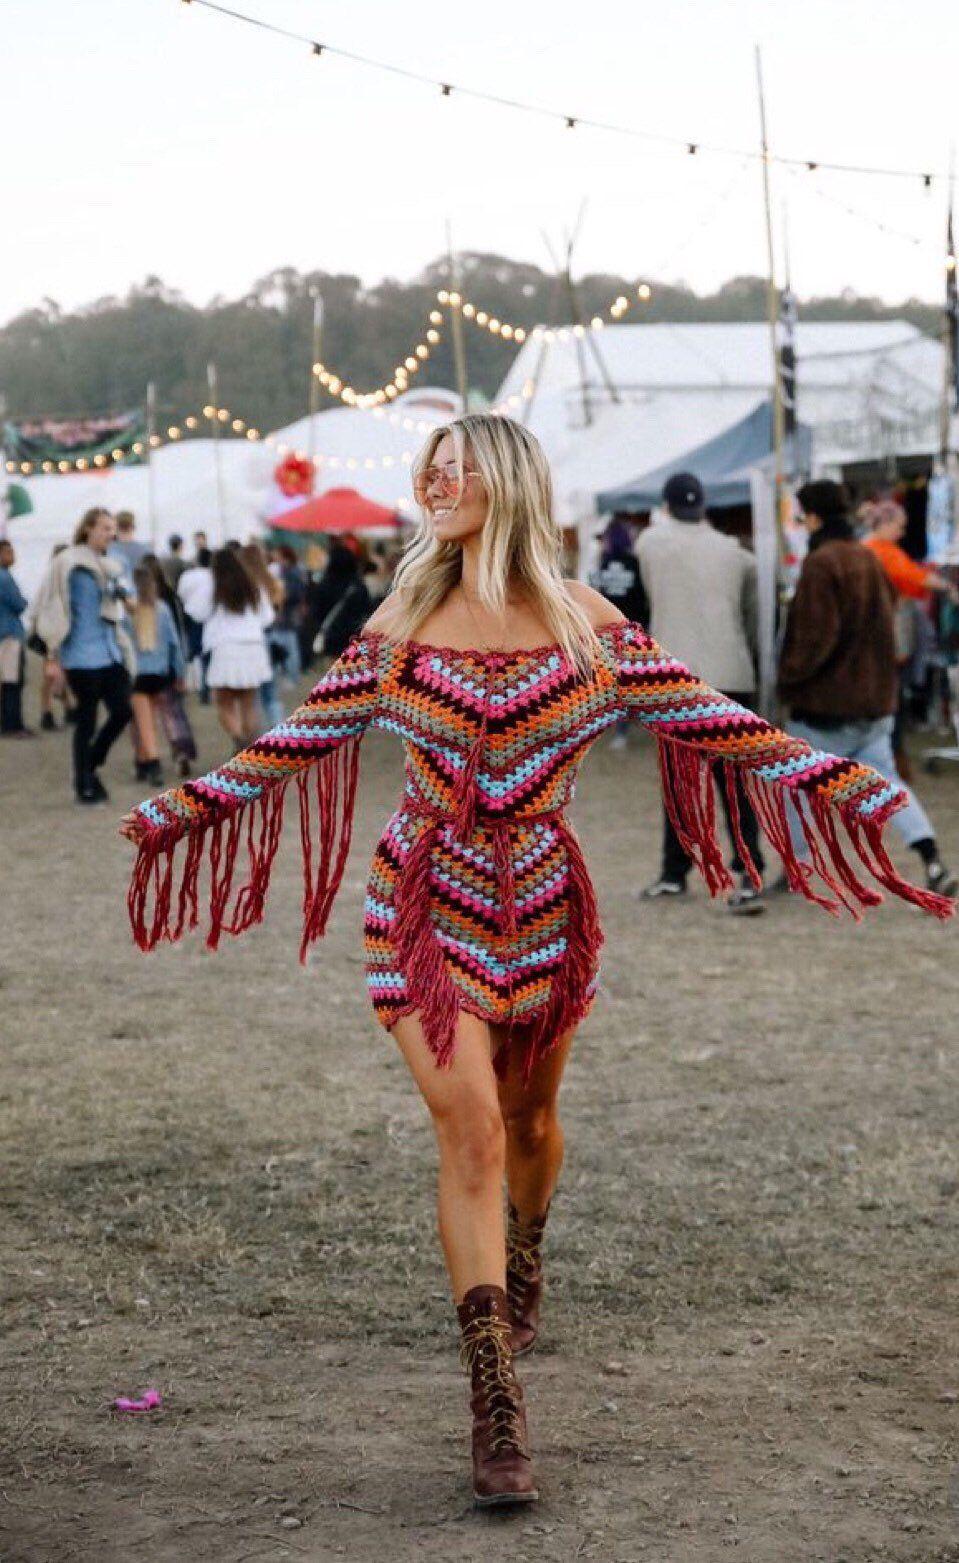 Crochet Fringed Top and Skirt, Boho Hippie Gypsy ,